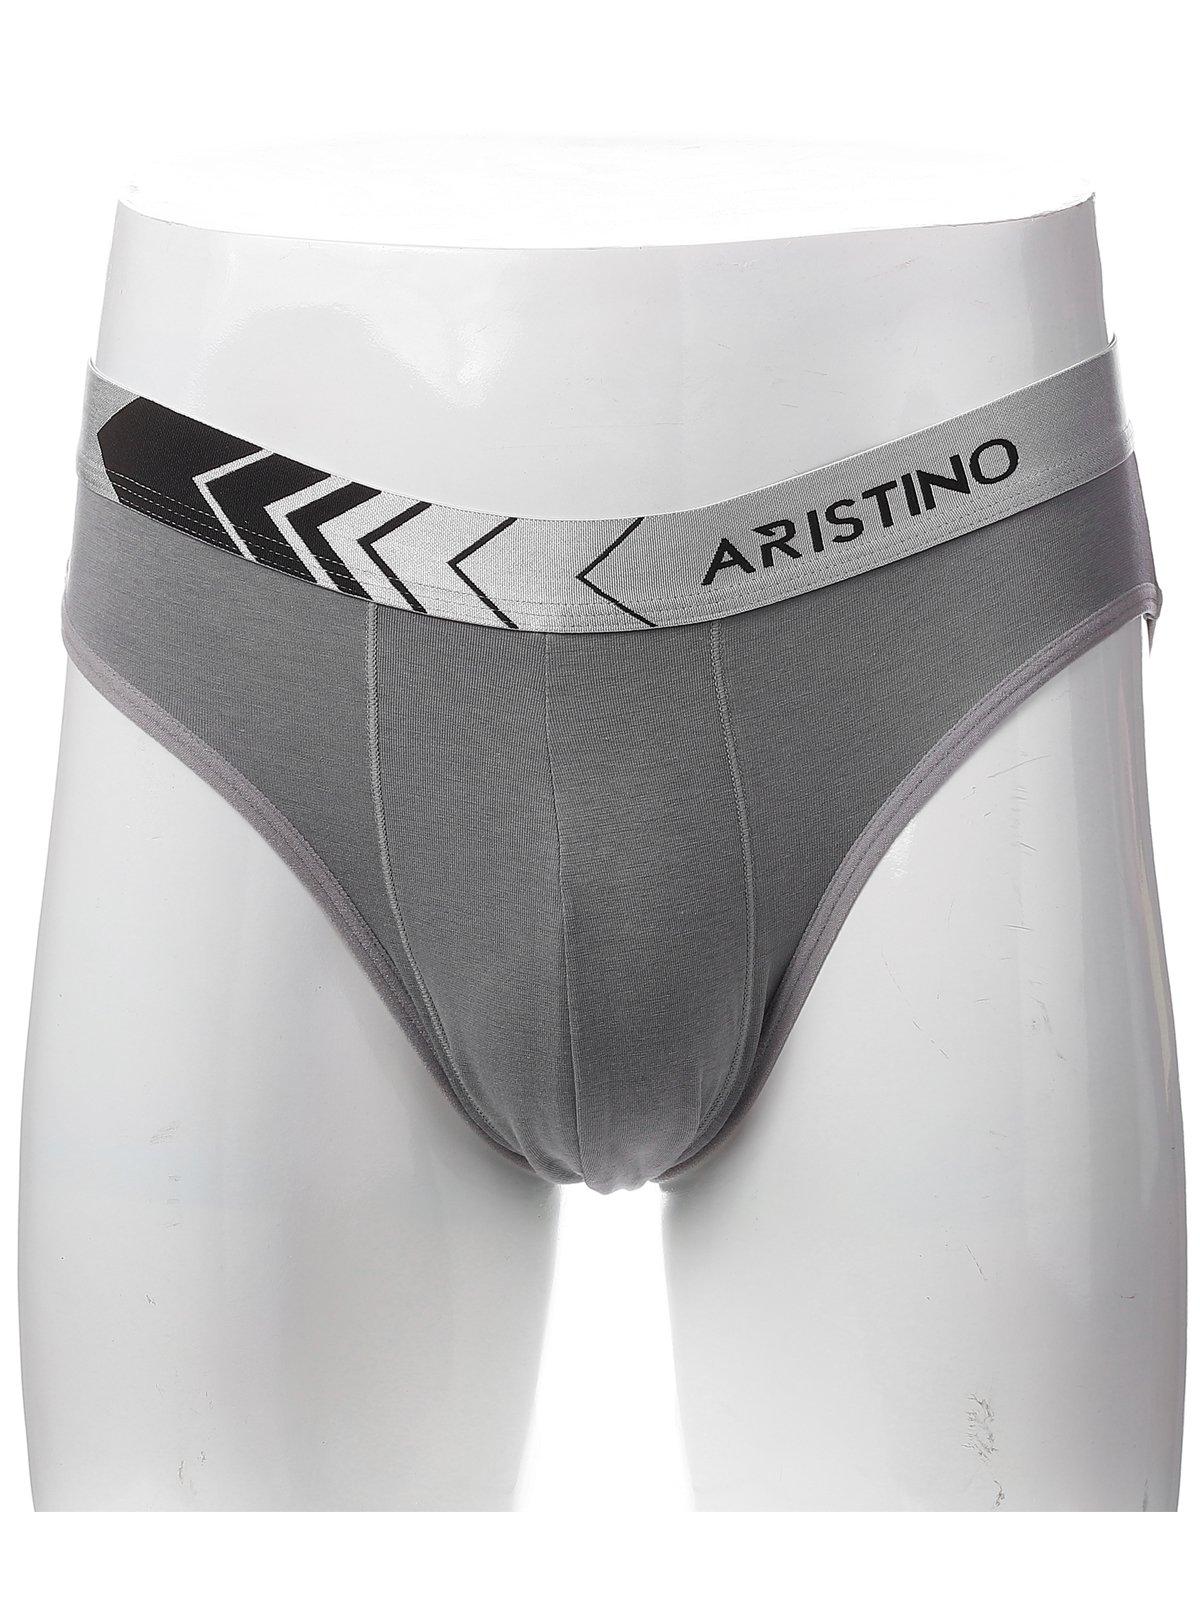 Quần sịp nam Aristino ABF01807